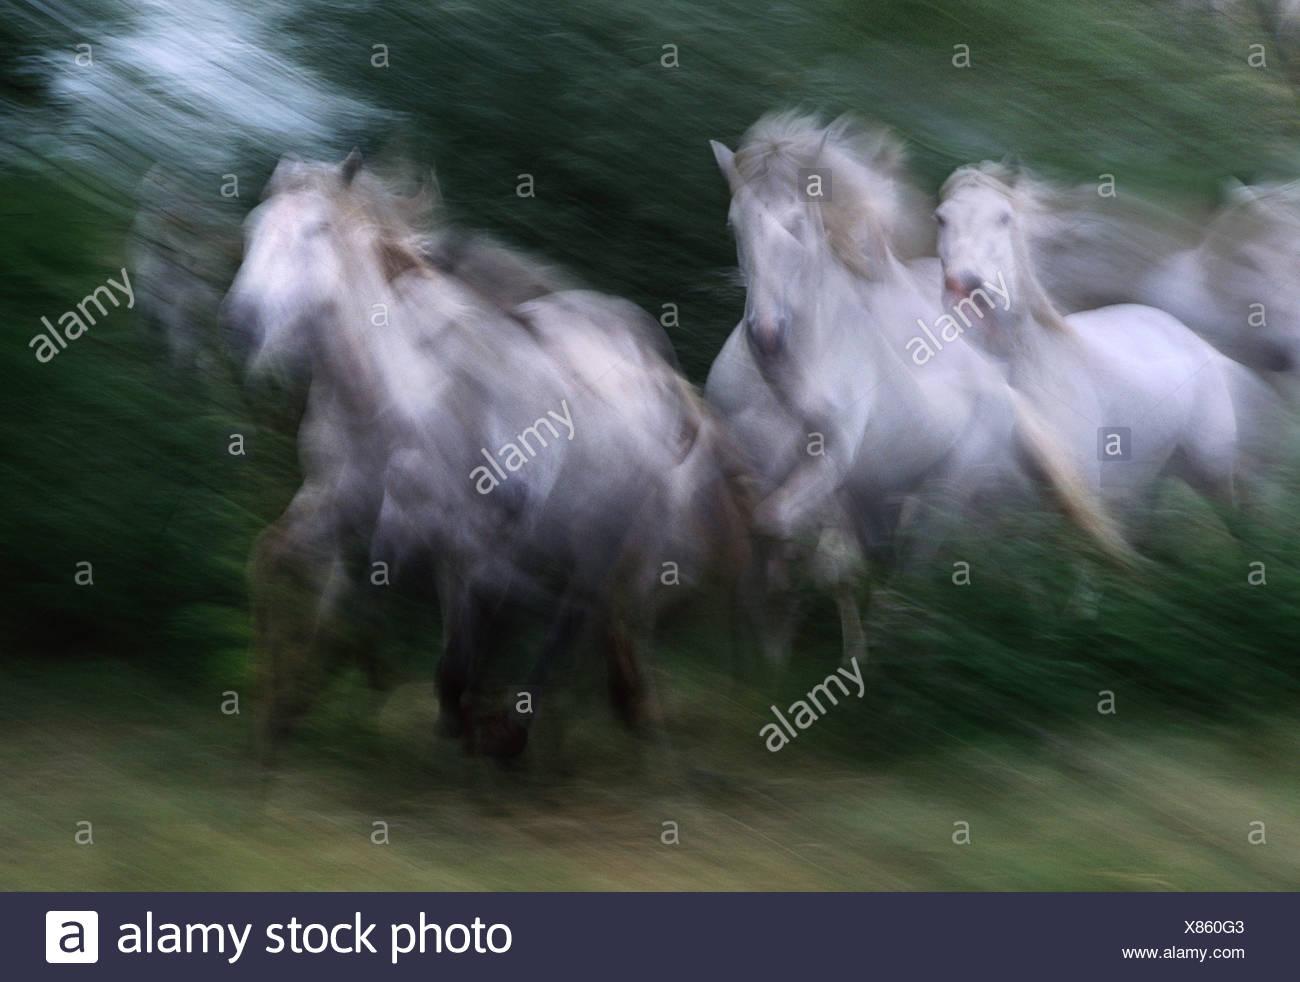 Herd of Camargue horses running France - Stock Image